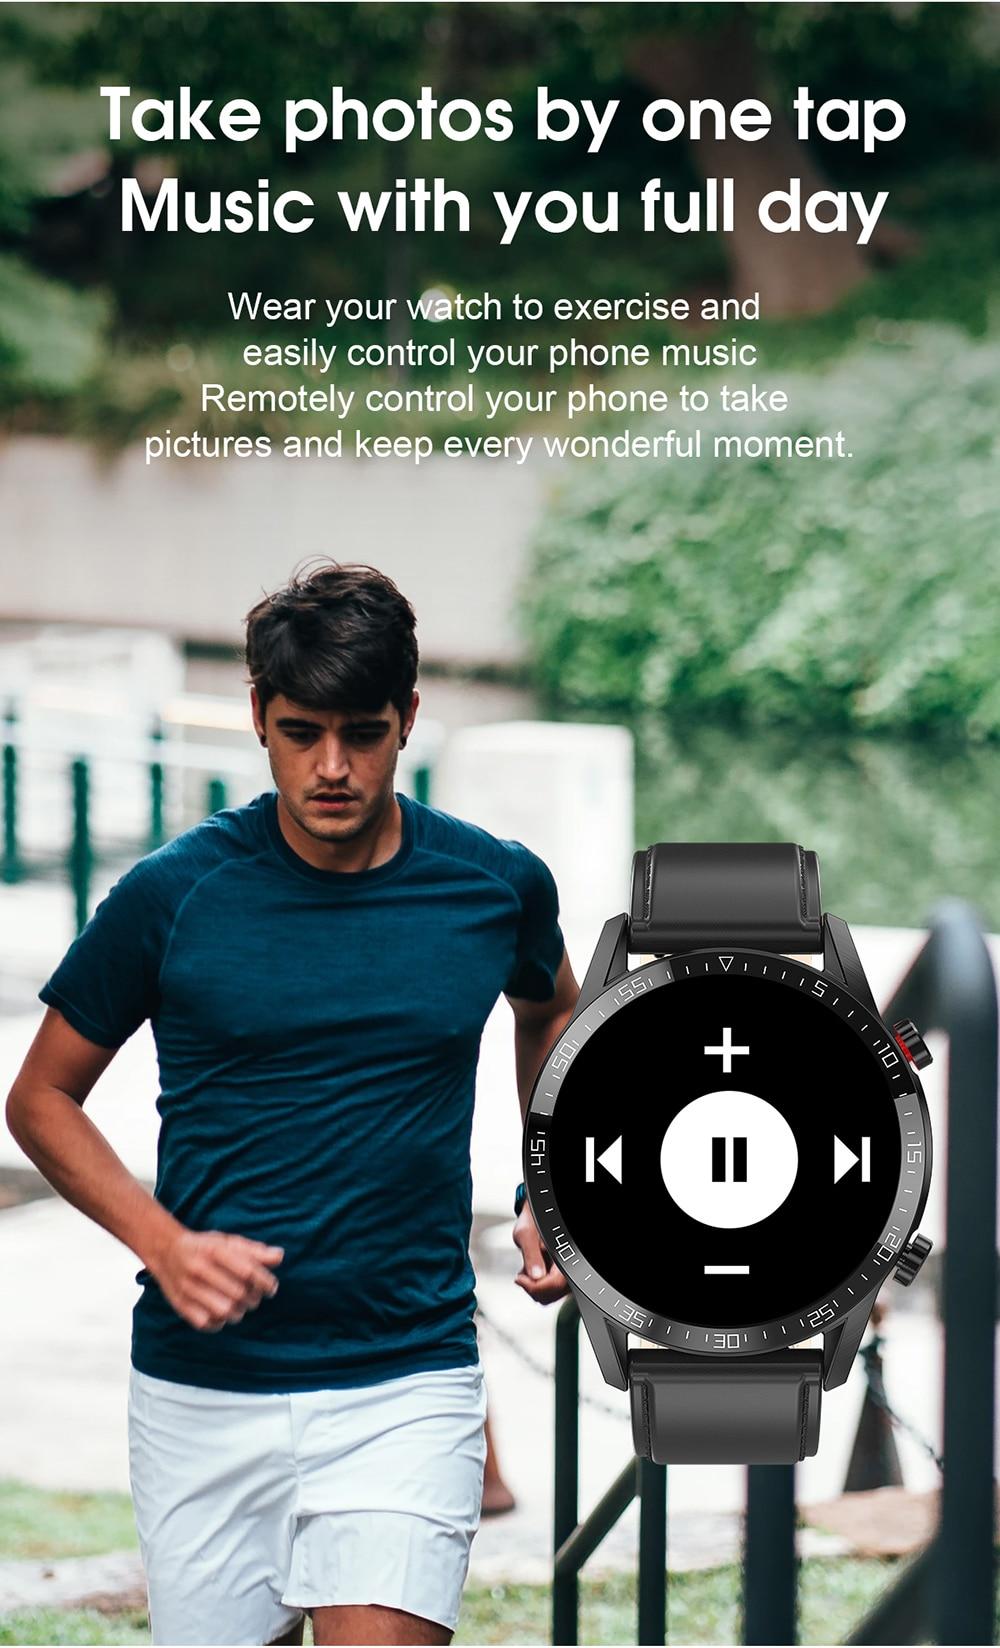 H7c0103b8e70f485f9c0a5d116084530cC For Phone Xiaomi Android IOS Reloj Inteligente Hombre Smartwatch Men 2021 Android IP68 Smartwatch Answer Call Smart Watch Man